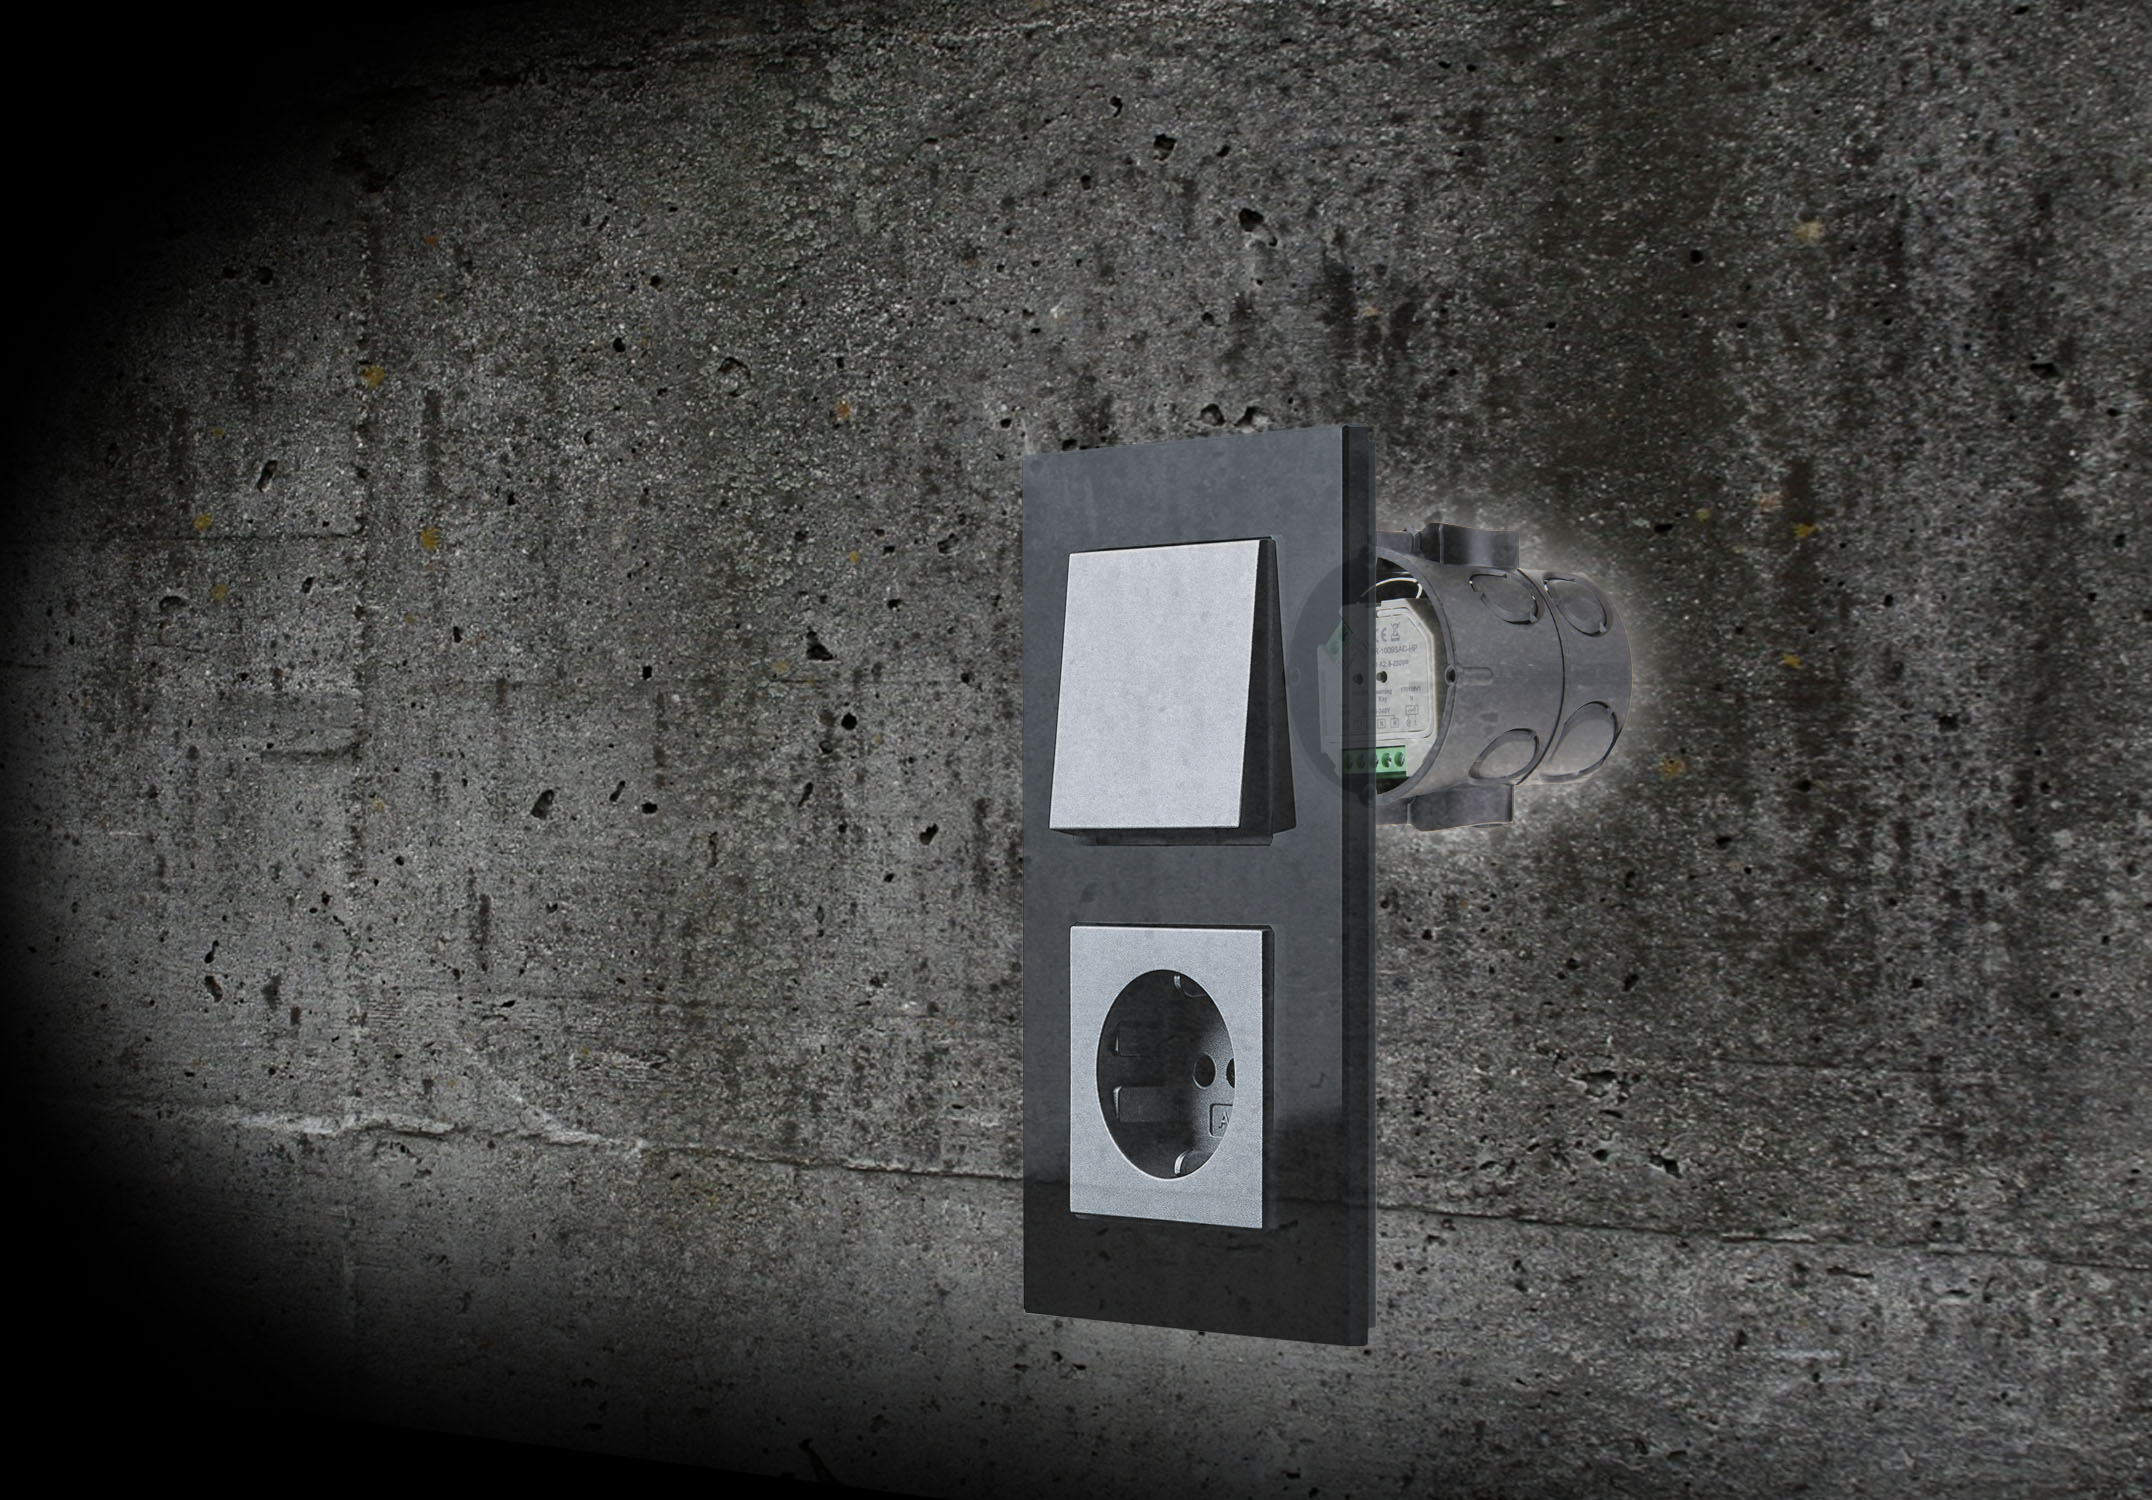 universal smart dimmer f r r l c lasten dimmbare 230v led lampen und triac s max 400watt. Black Bedroom Furniture Sets. Home Design Ideas